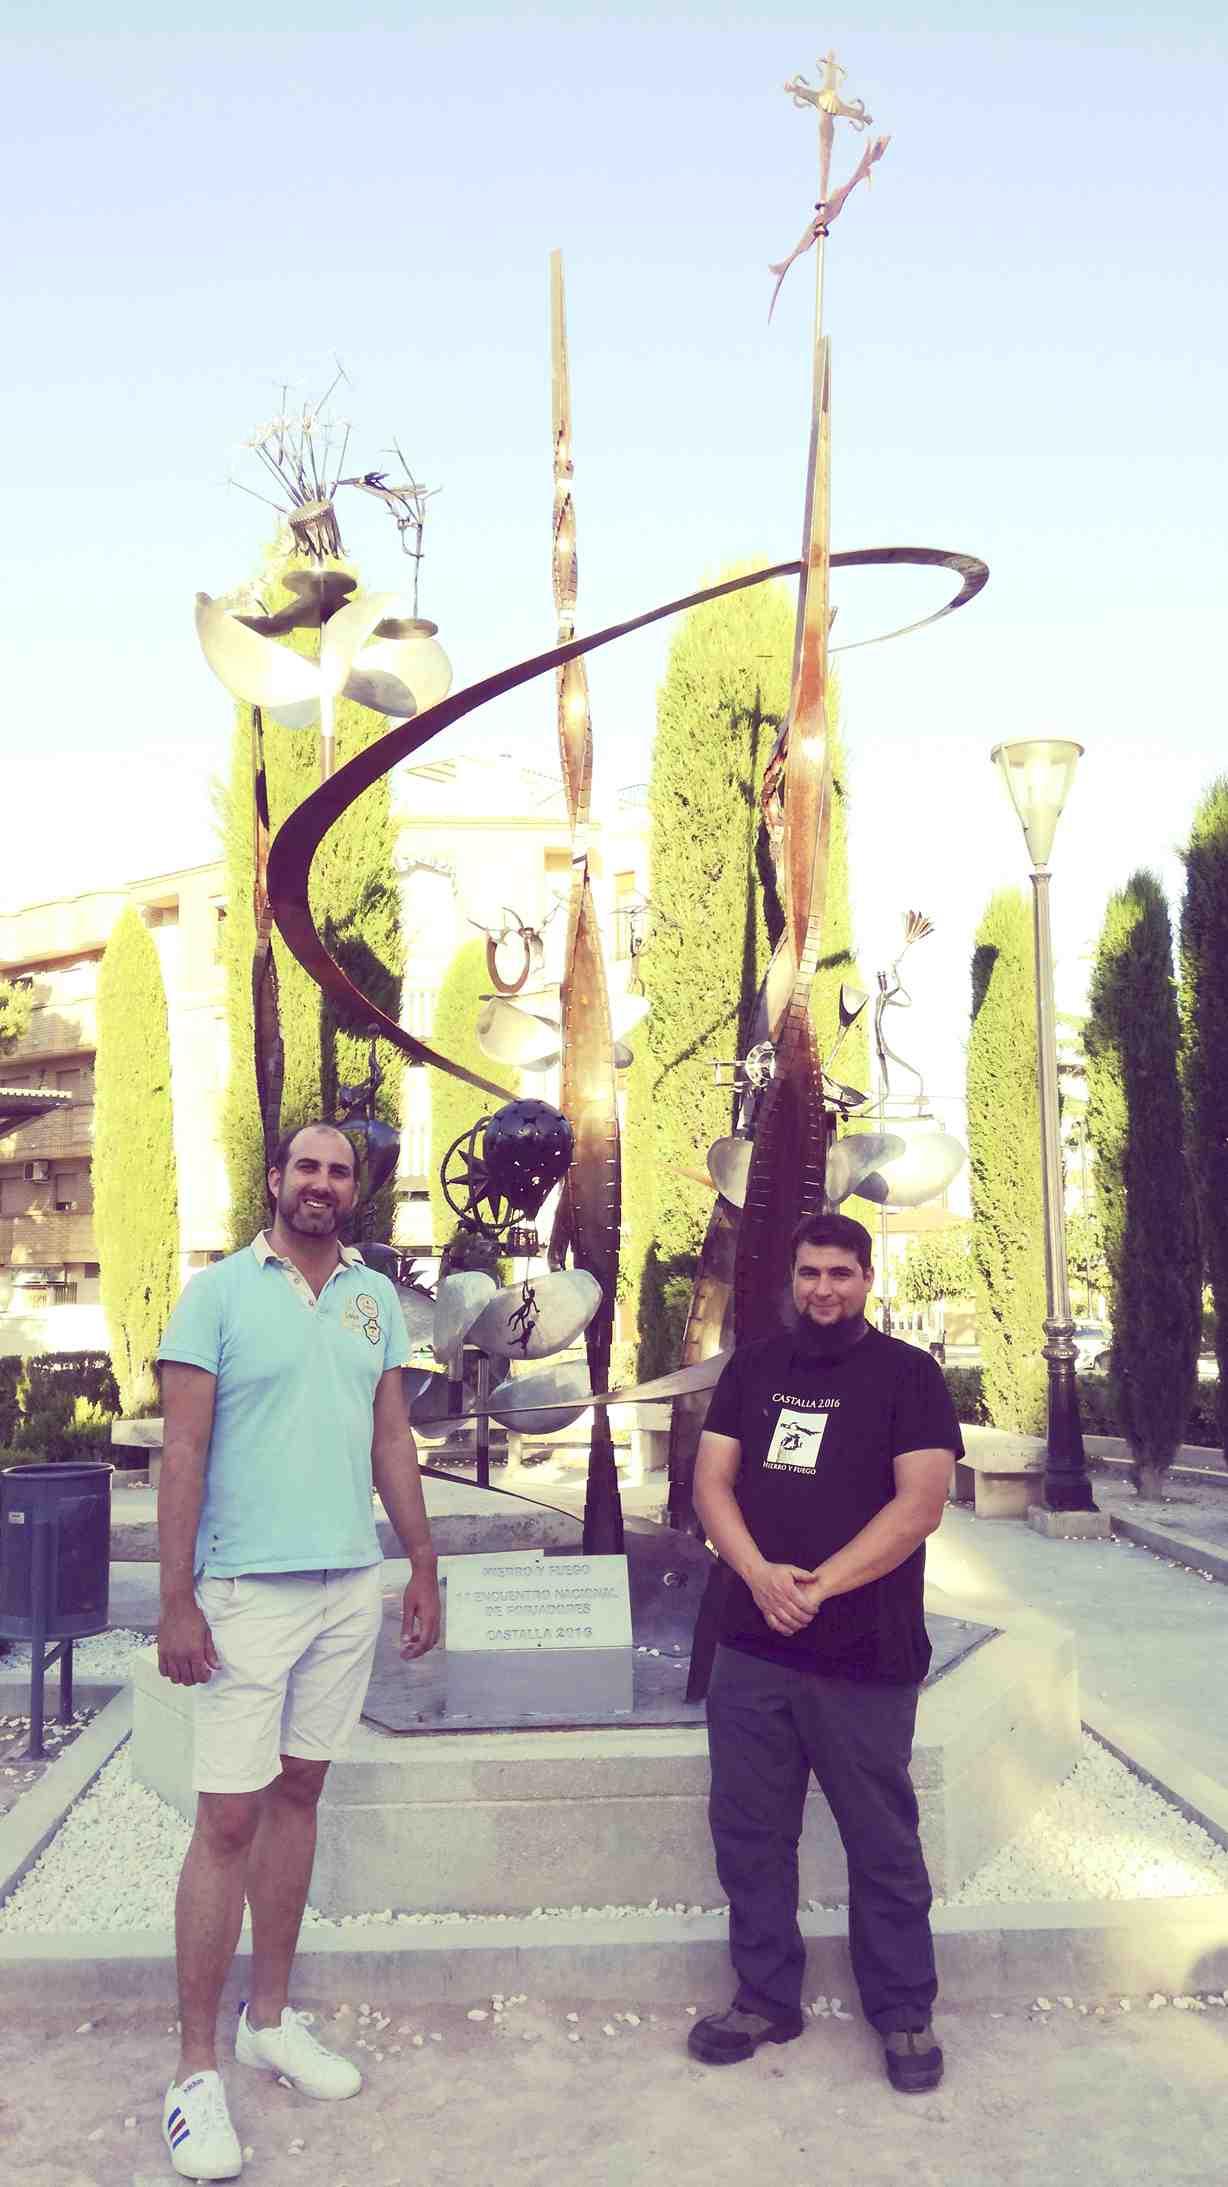 Instalada en el Parque Municipal de Castalla la escultura del I Encuentro Nacional de Forjadores